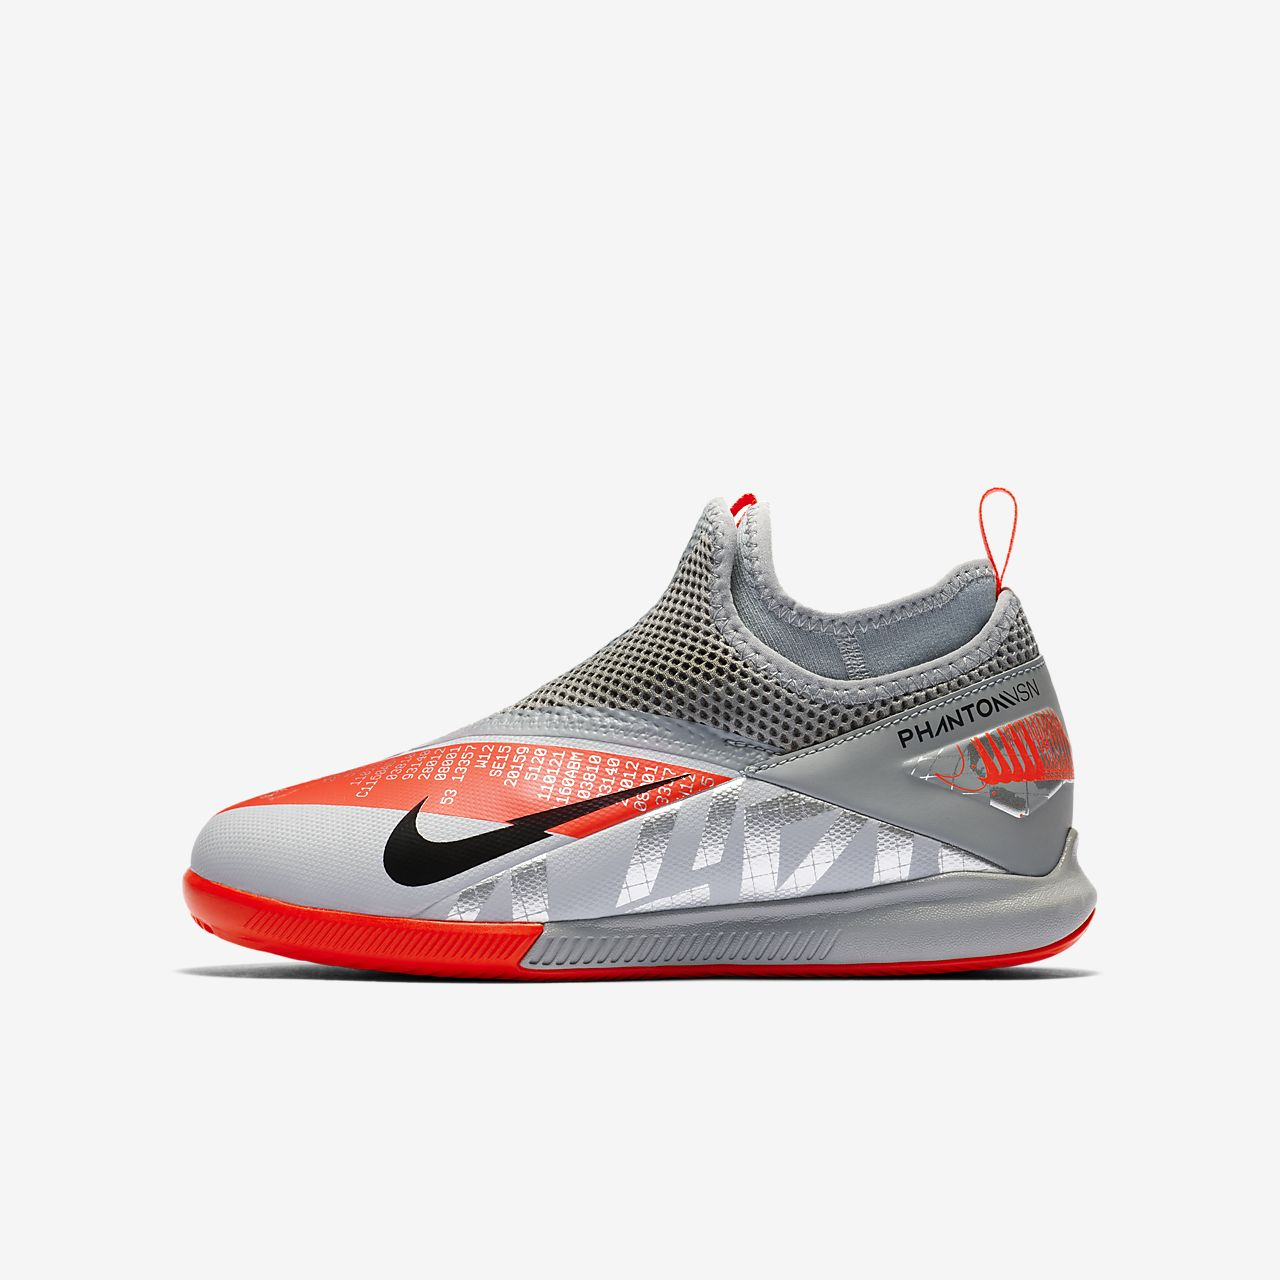 Nike Jr. Phantom Vision 2 Academy Dynamic Fit IC Younger/Older Kids' Indoor Court Football Shoe